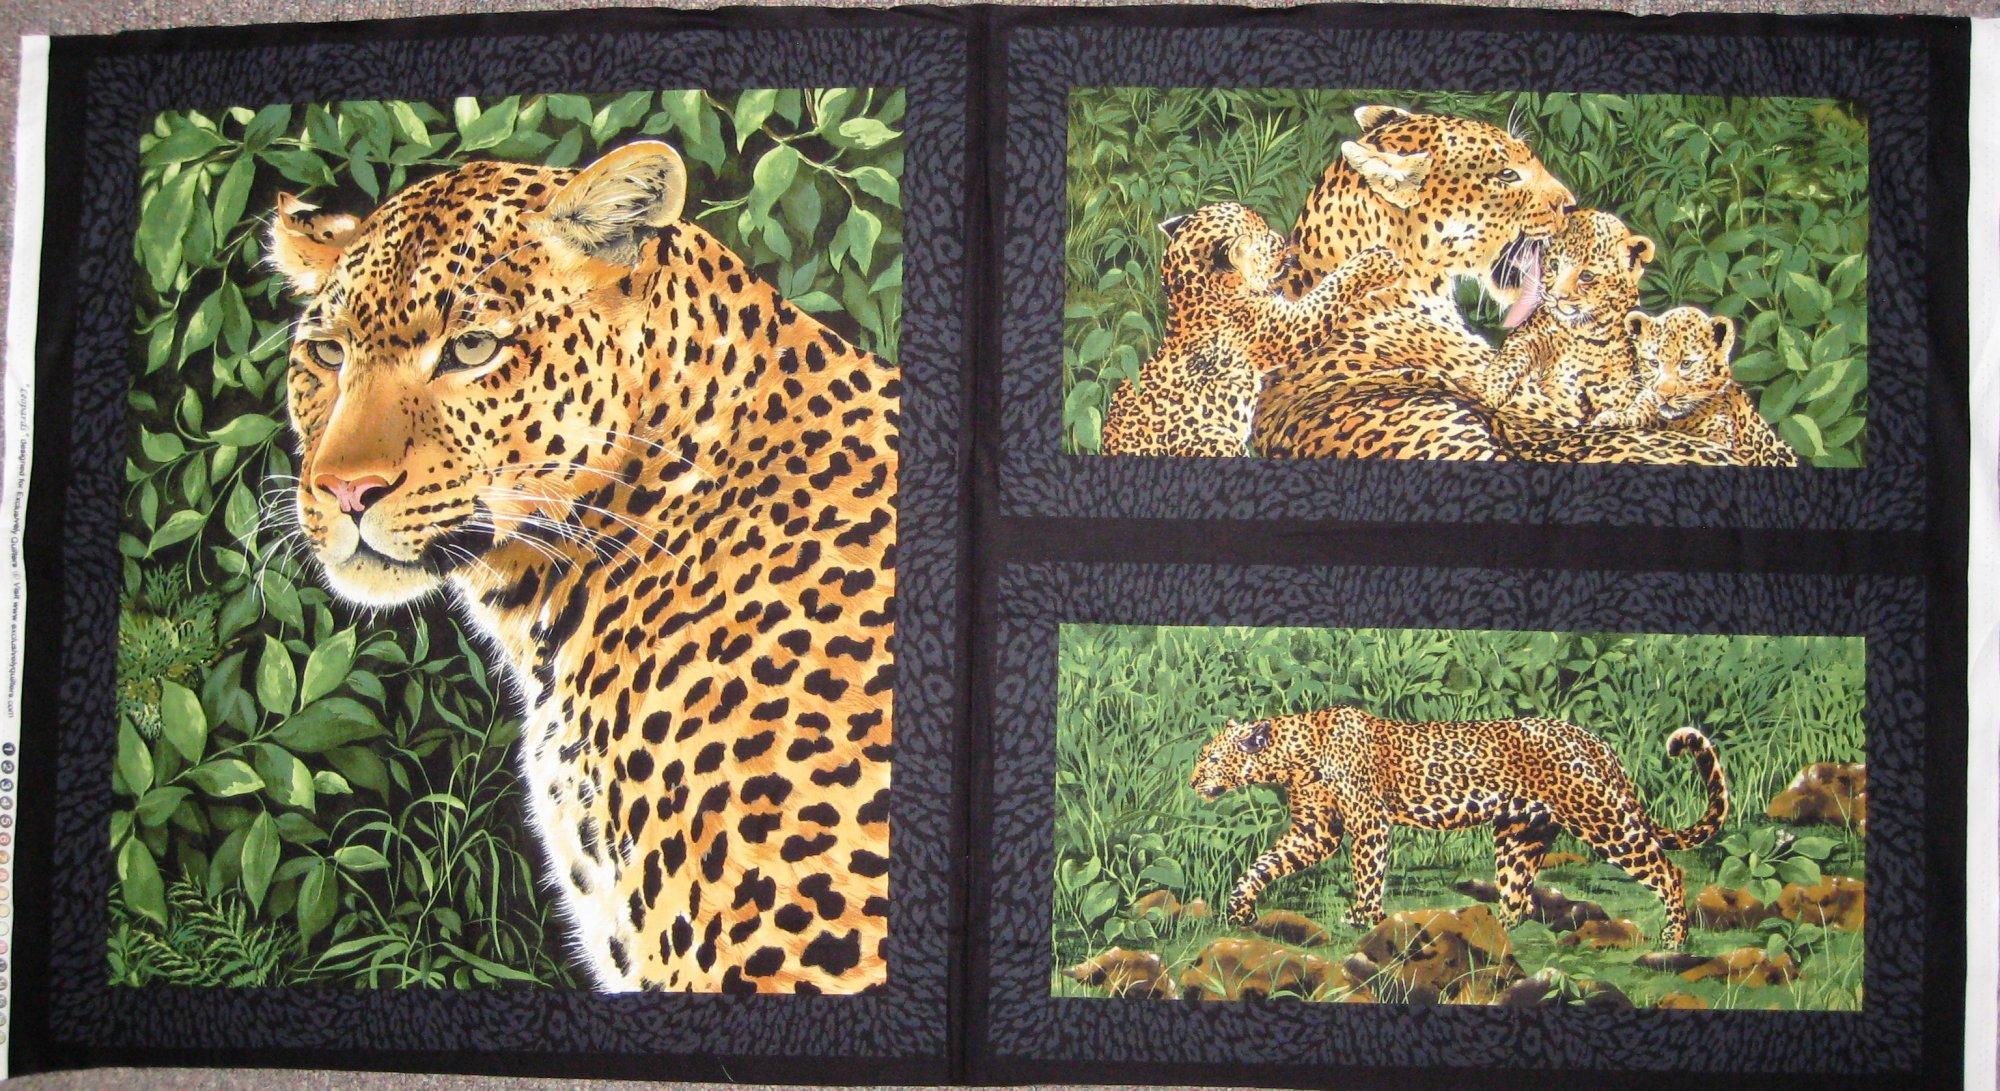 Leopard 8587 24 Panel